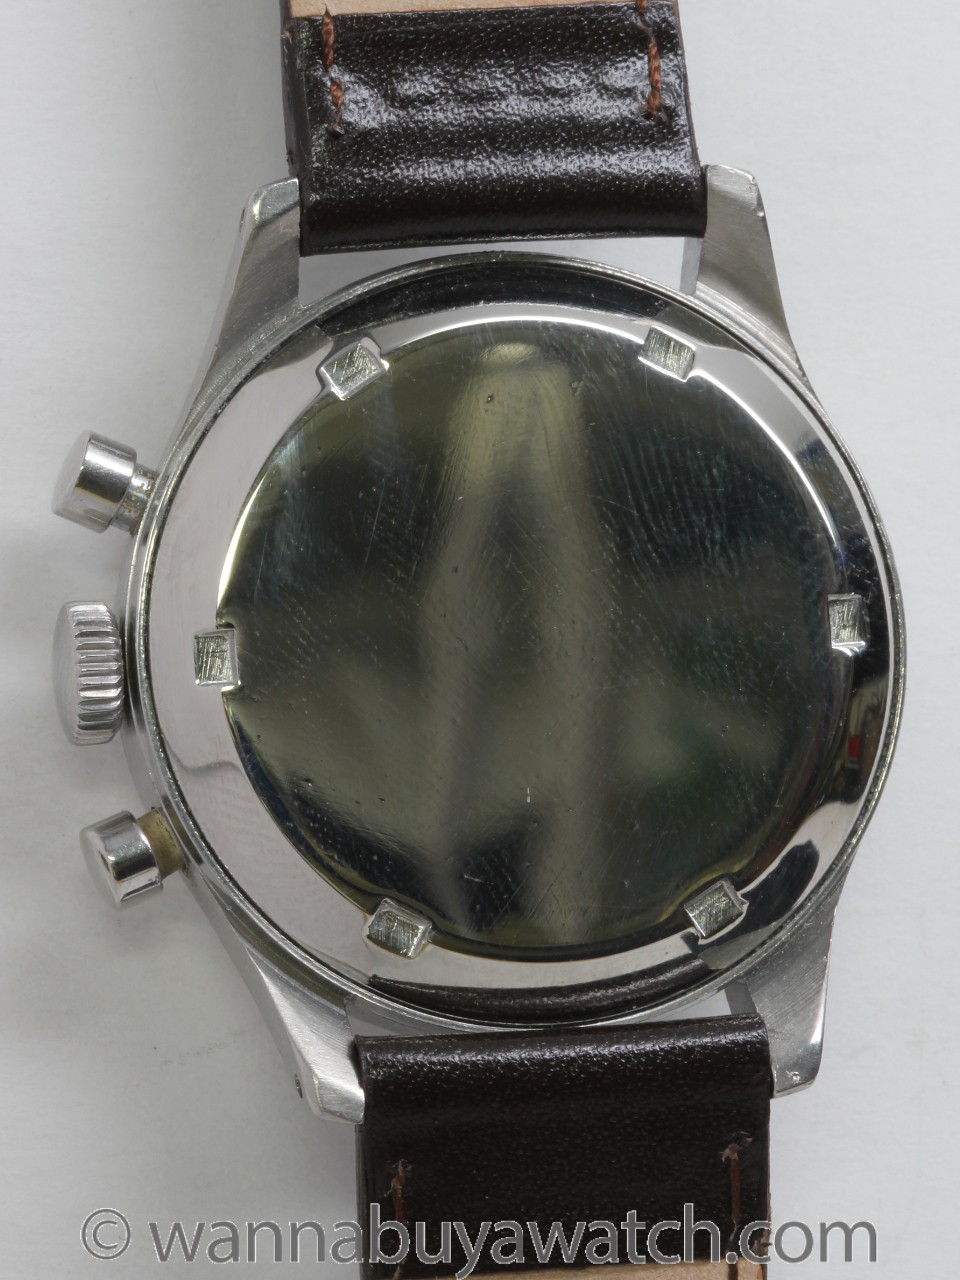 AR & JE Meylan 3 Registers Chronograph circa 1950's